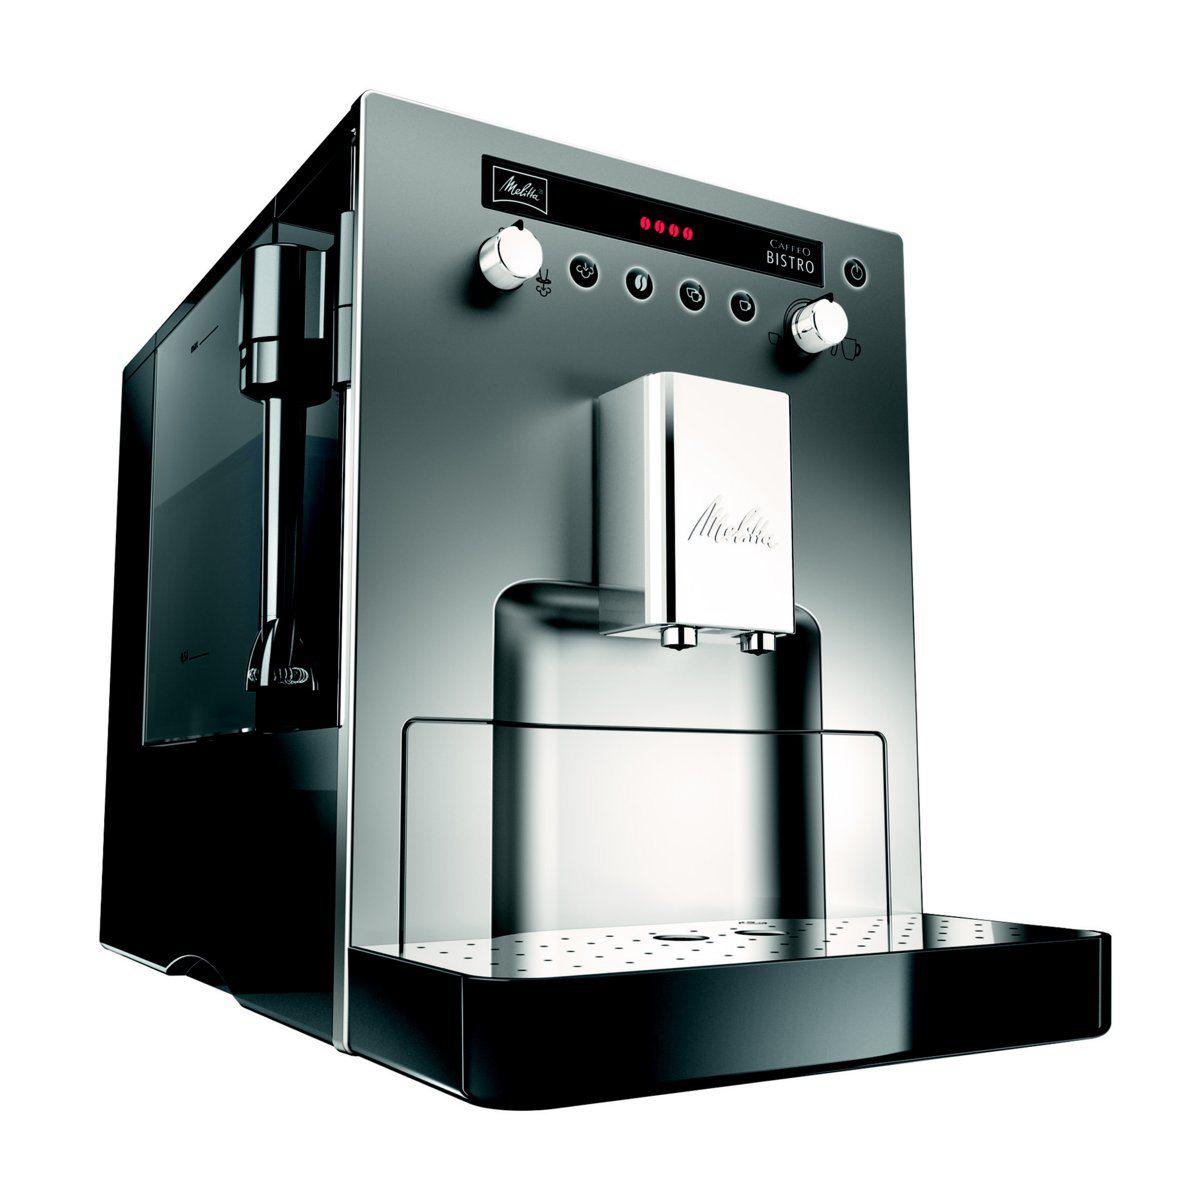 Cafetière Caffeo Bistro MELITTA avec code promo et ODR